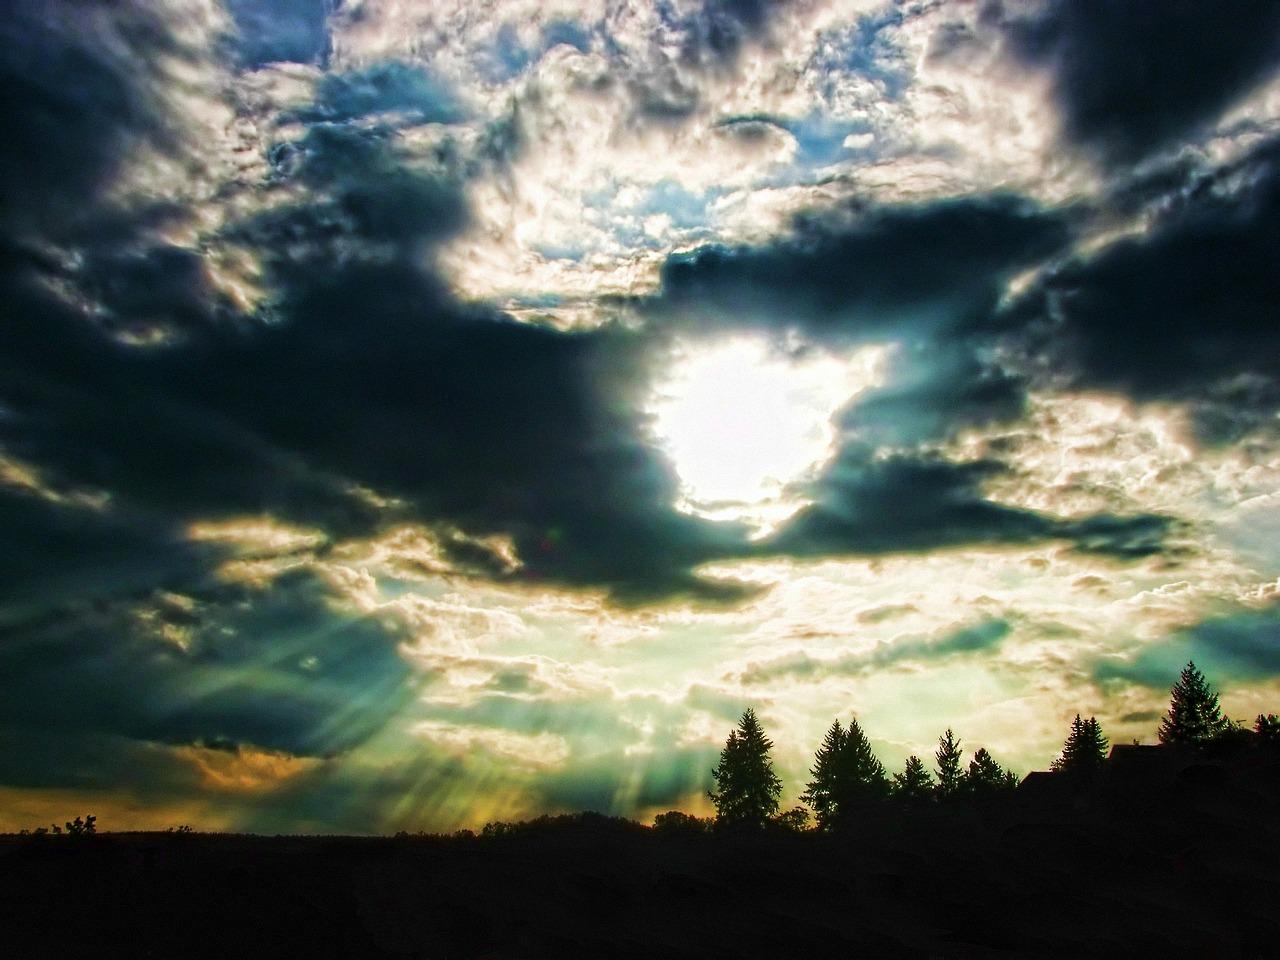 sunlight-202566_1280